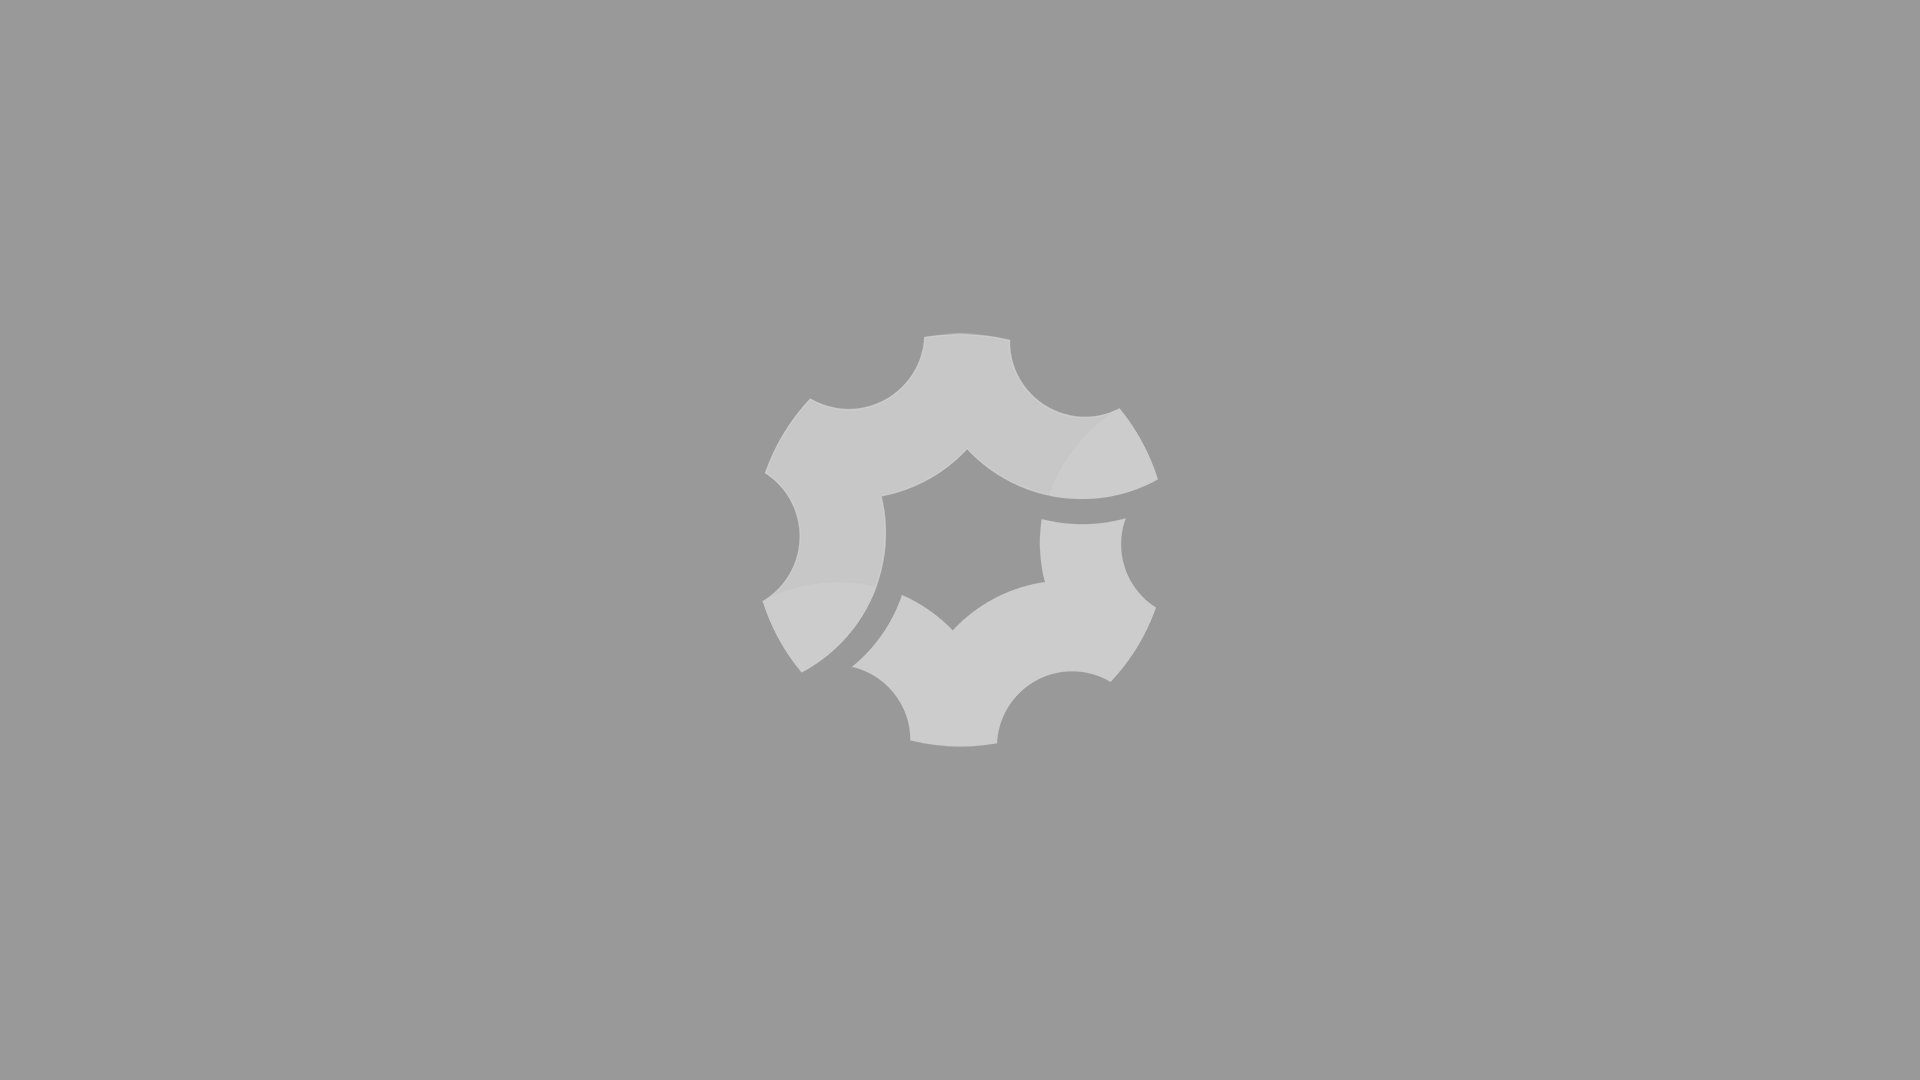 desktop_screenshot_2020.06.25_-_16.58.22.14.png